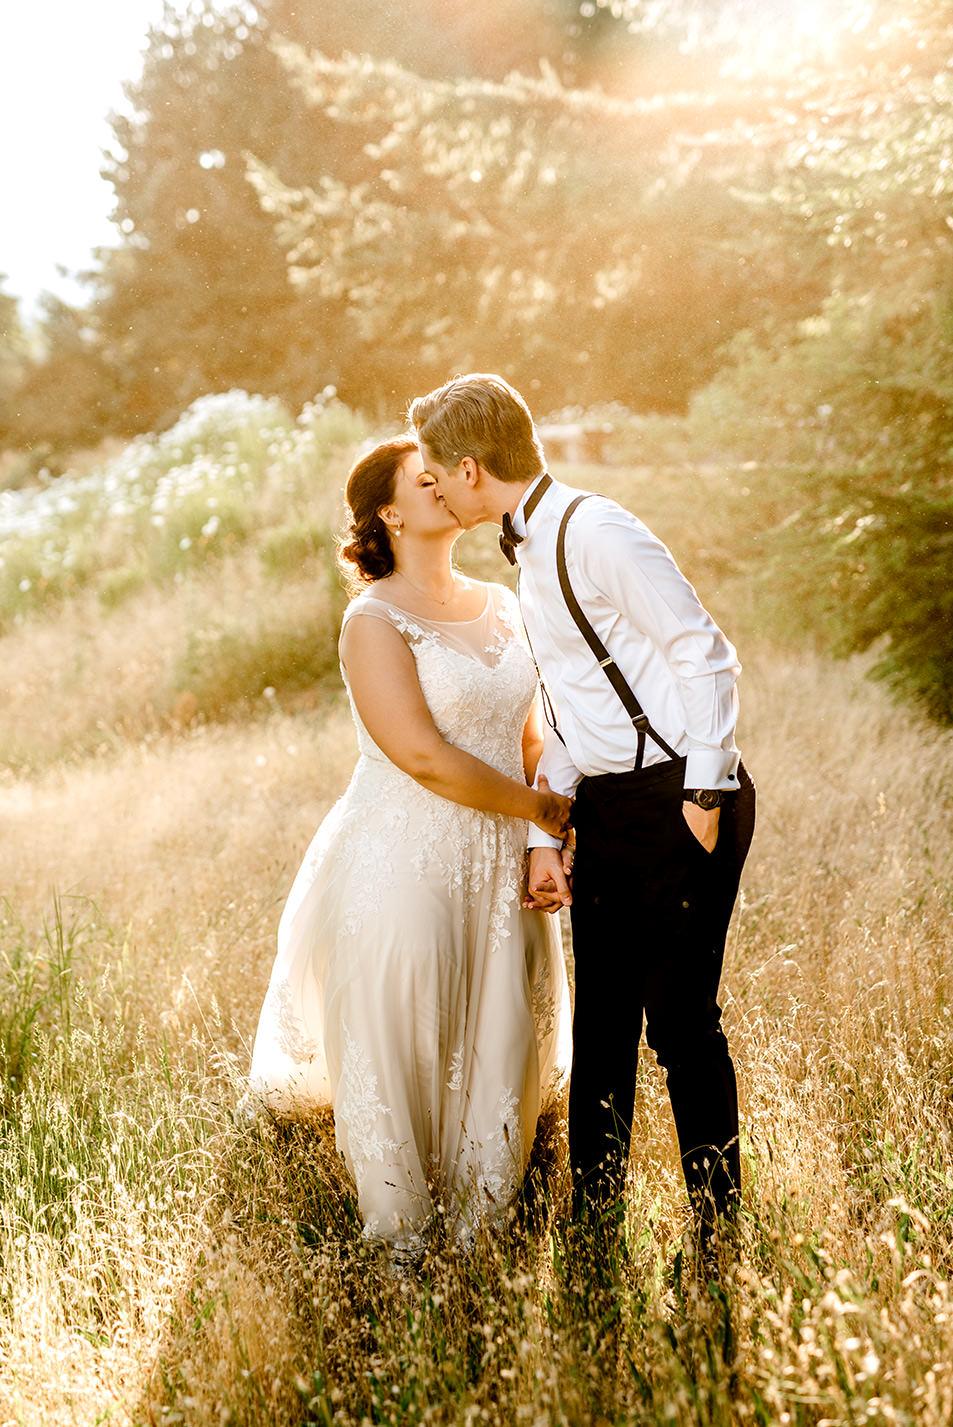 Citrus-inspired-wedding-at-Gorge-Crest-Vineyard-095.jpg